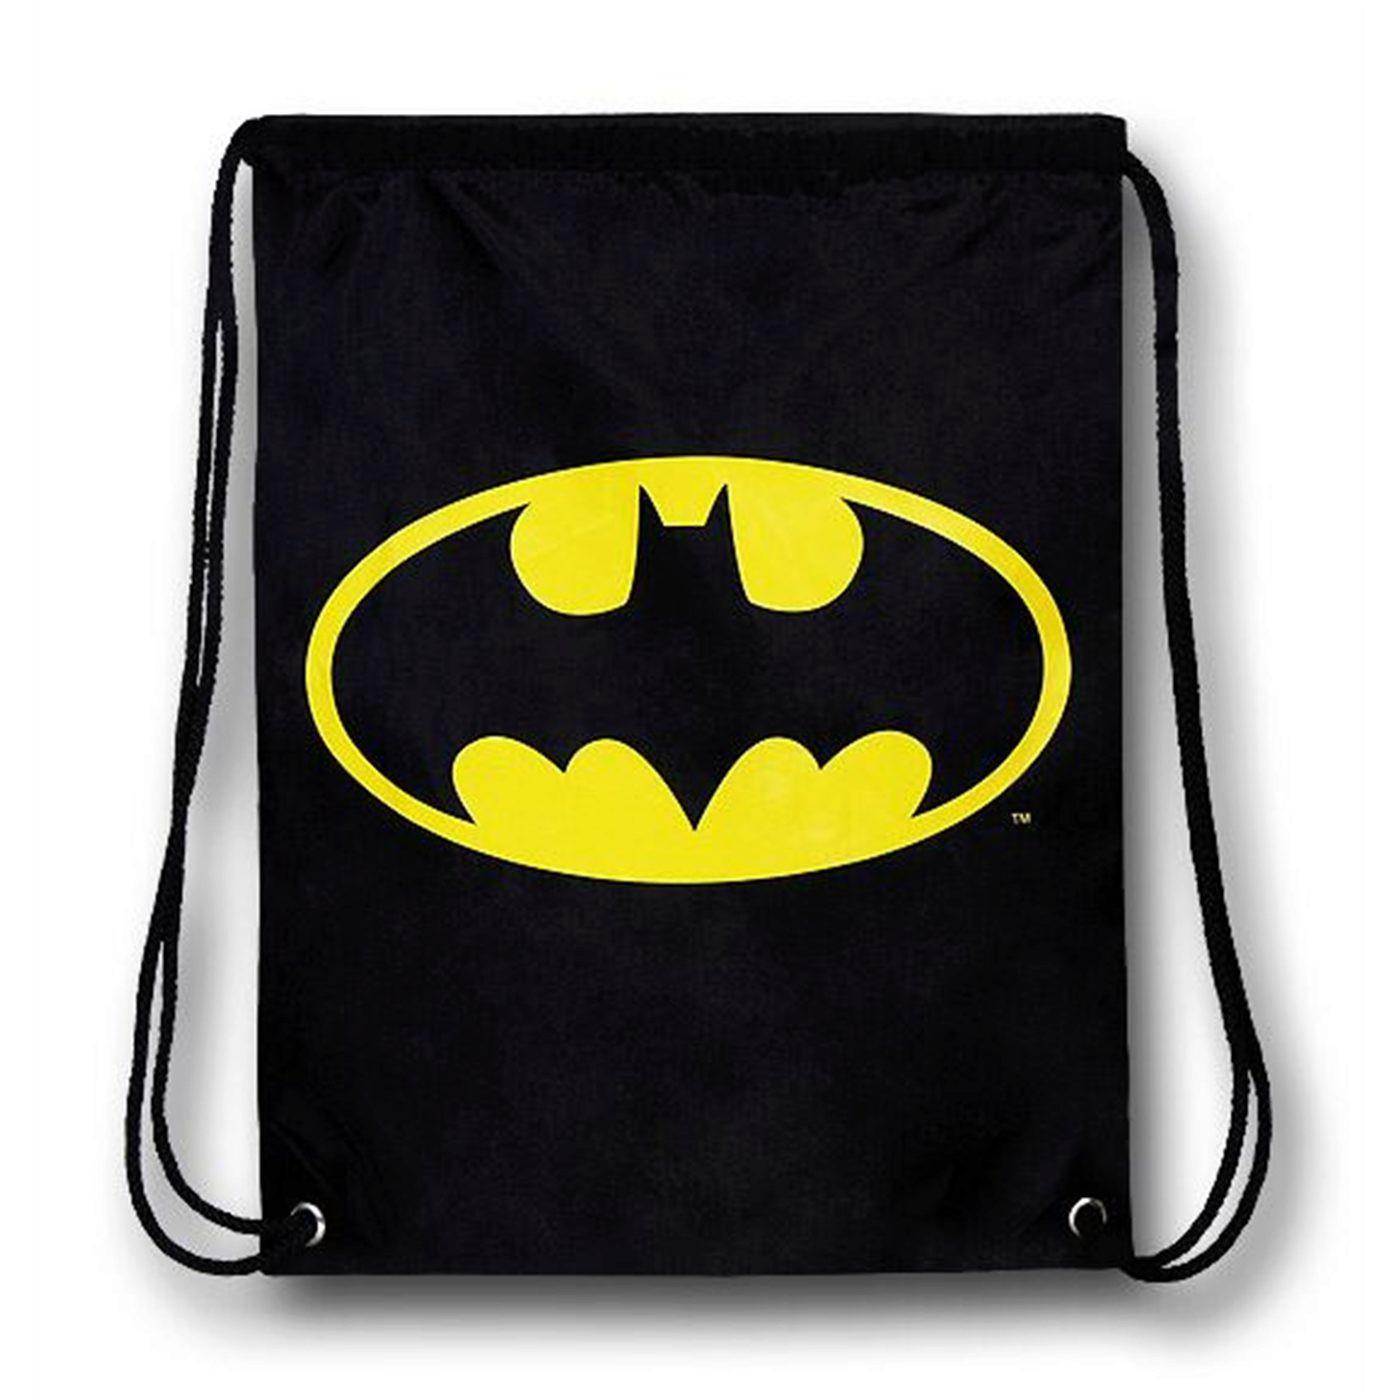 Batman Face Hooded Symbol Backsack